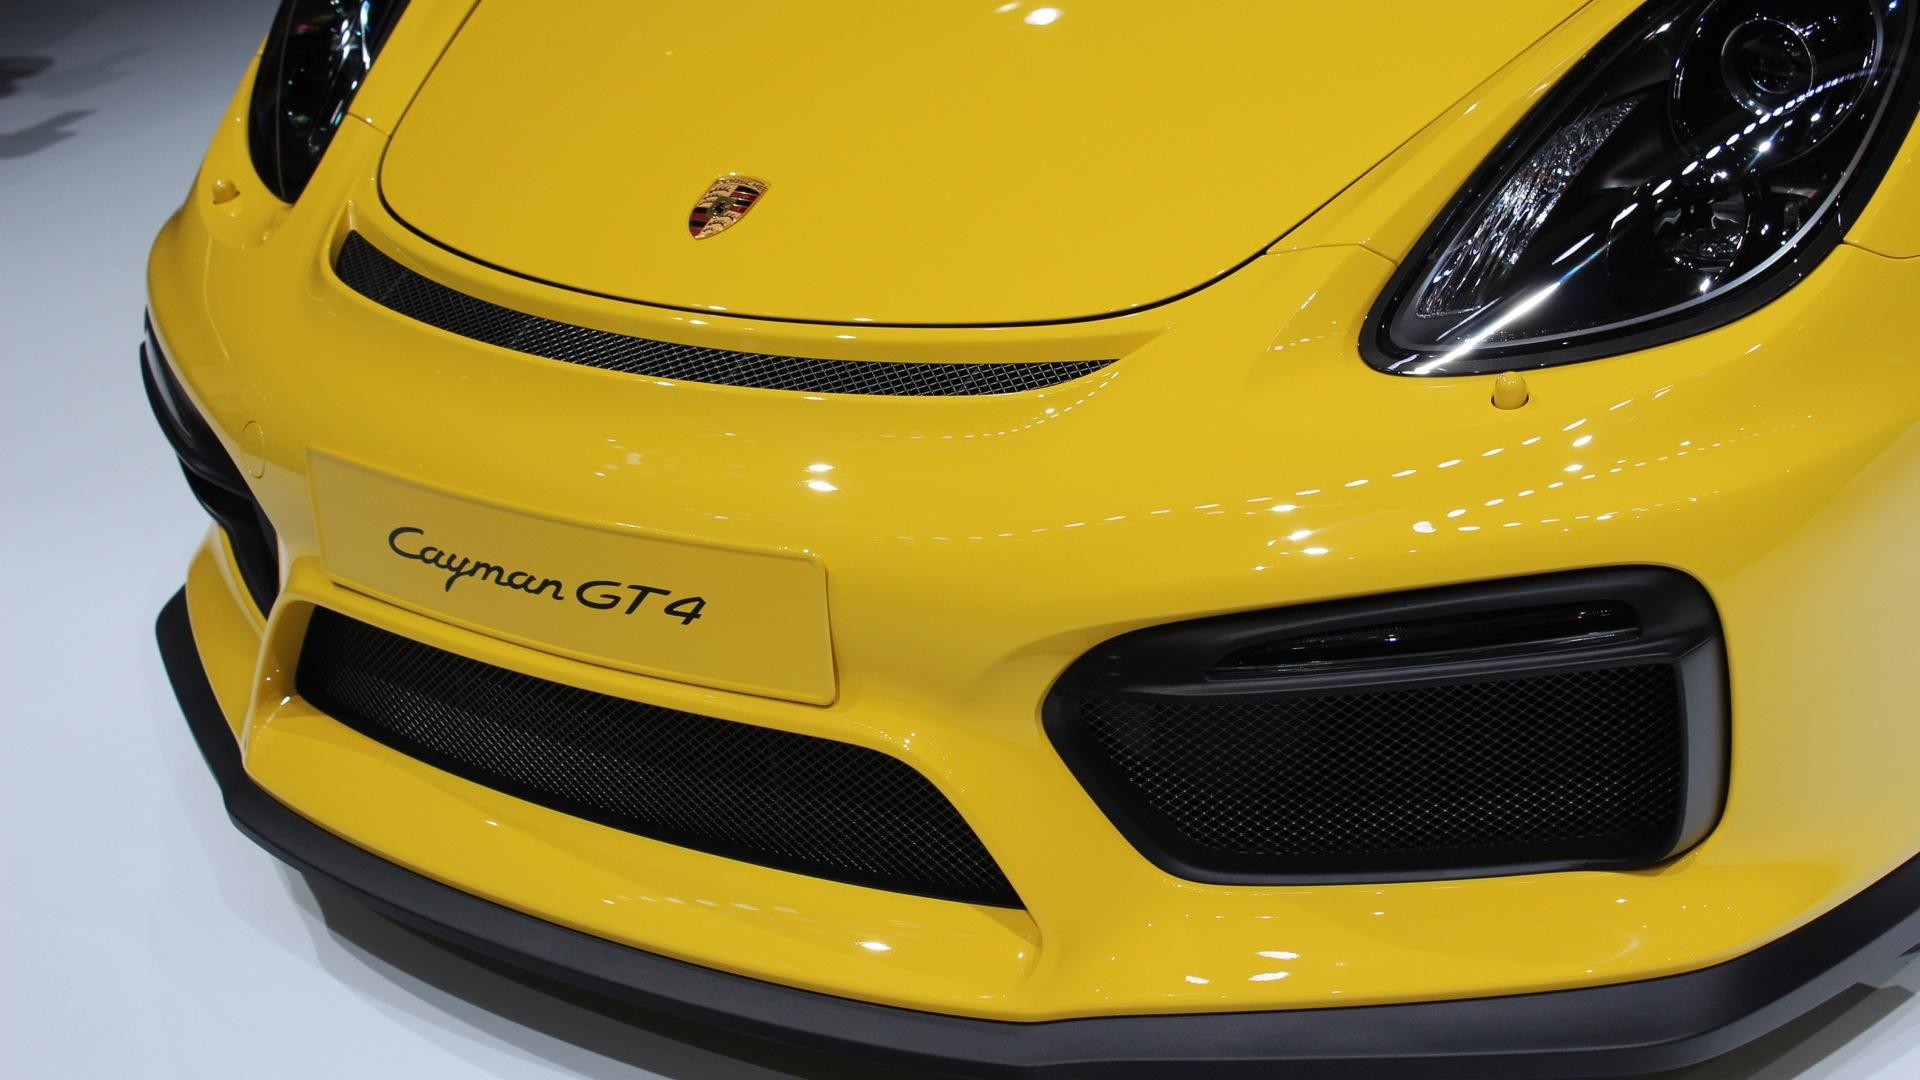 2016 Porsche Cayman GT4  -  2015 Geneva Motor Show Live Photos